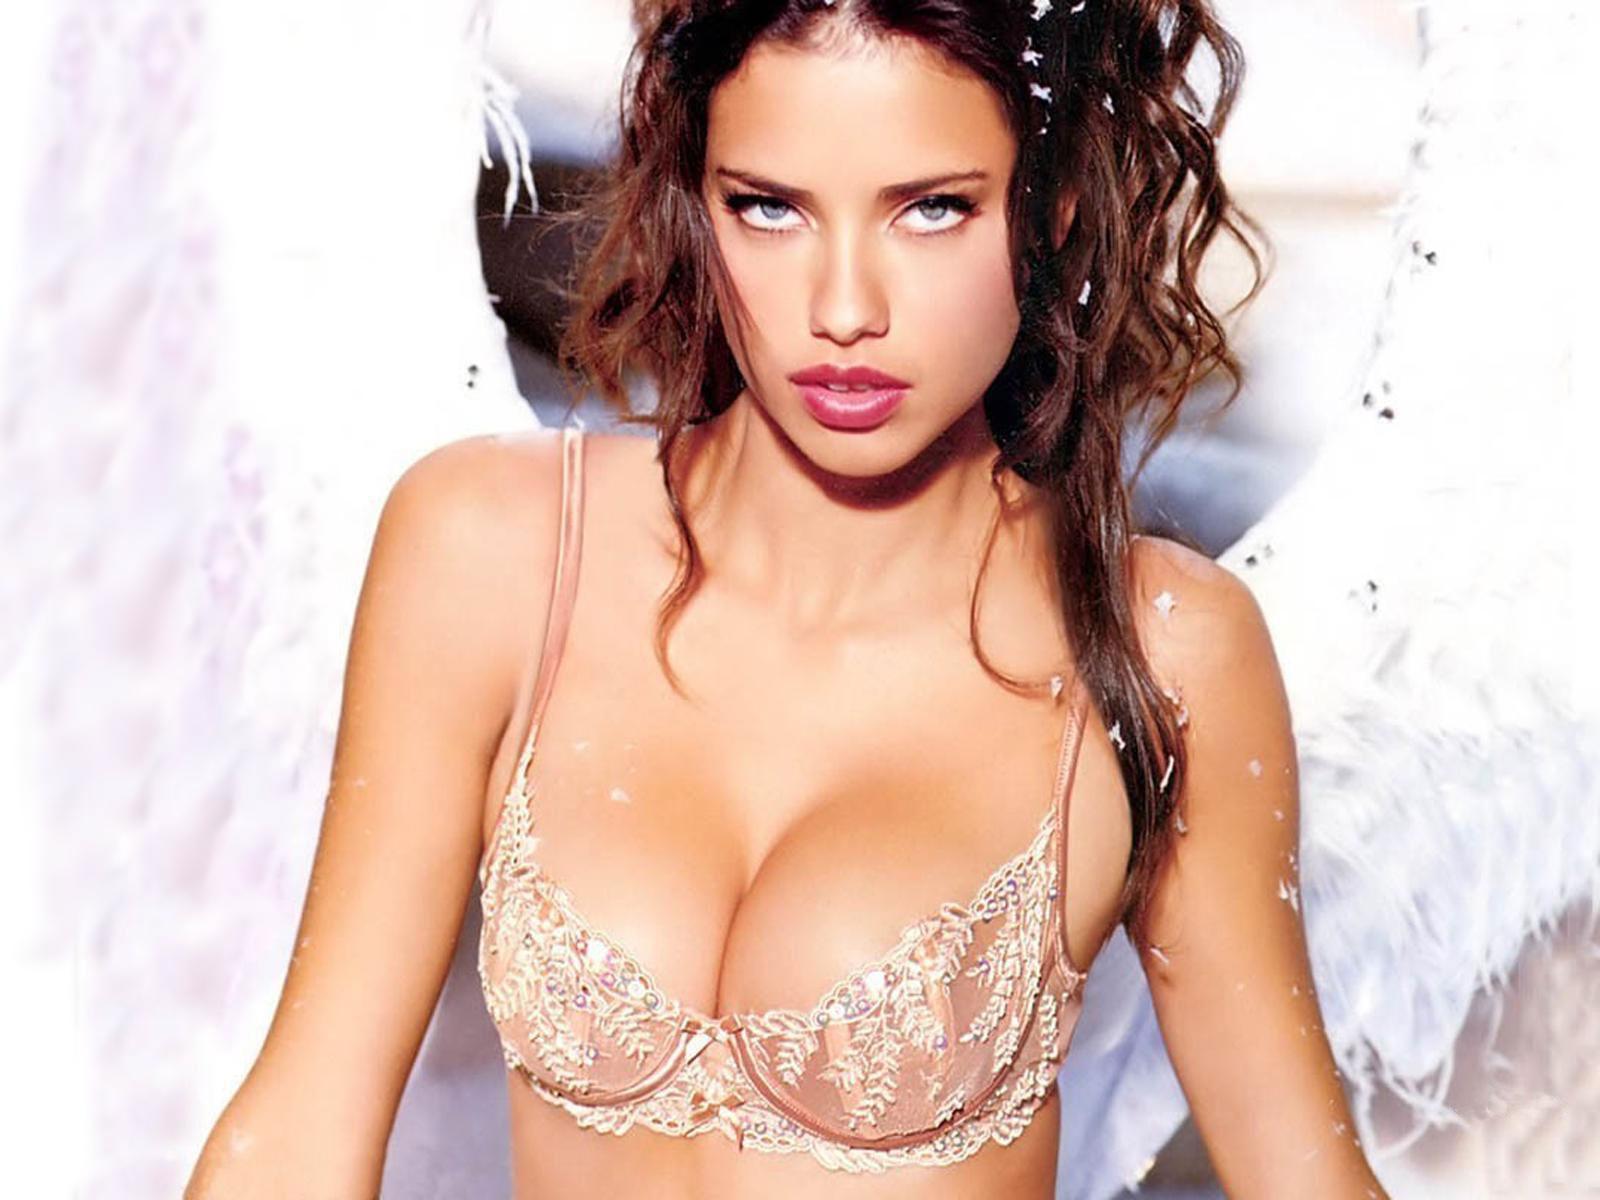 http://1.bp.blogspot.com/-mJGw_gdGqBA/Ta4A13TuhNI/AAAAAAAAAlY/hollVMipWok/s1600/adriana-lima+tits.jpg